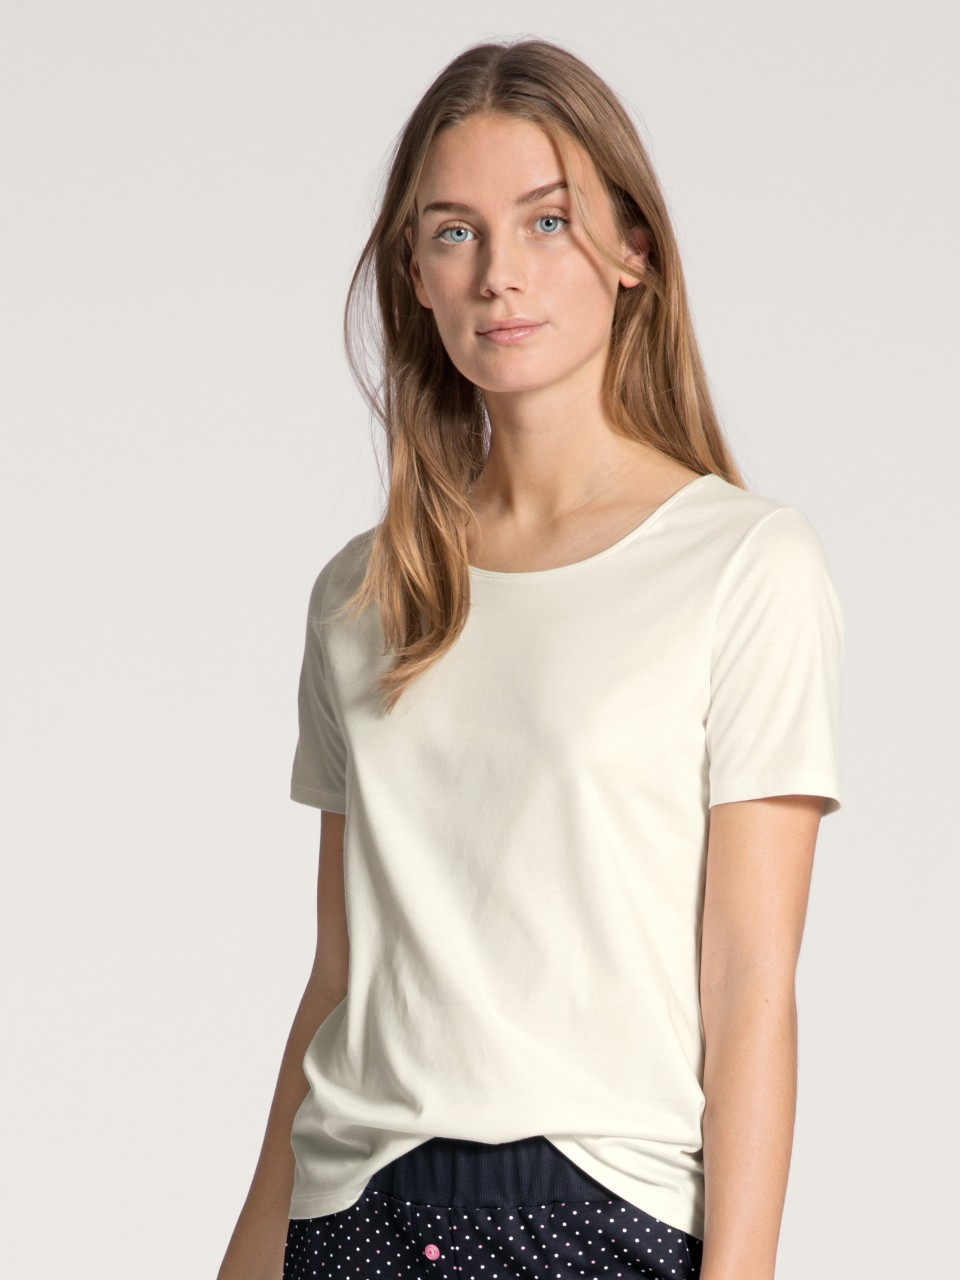 14038 910 tee-shirt crème rose 100% coton supima Prix : 39.95 €